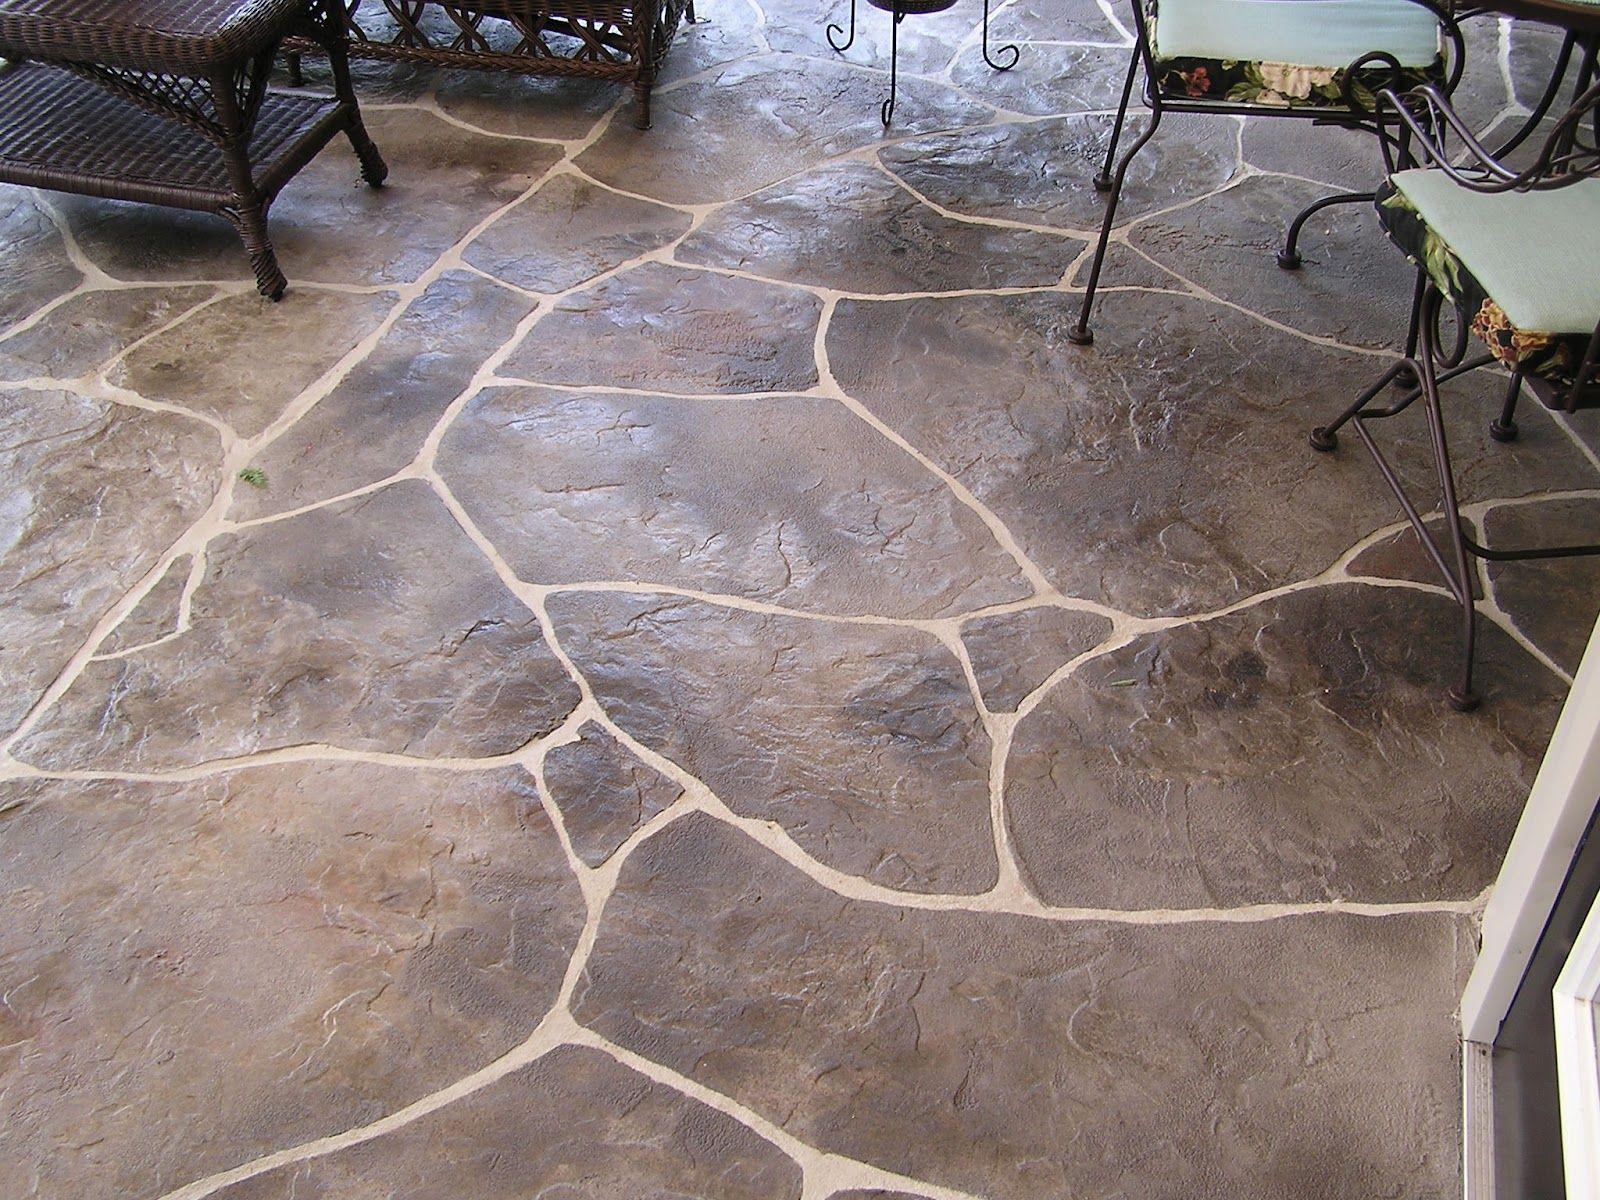 Textured Concrete Patio Designs Stamped Concrete Porch Pattern Is